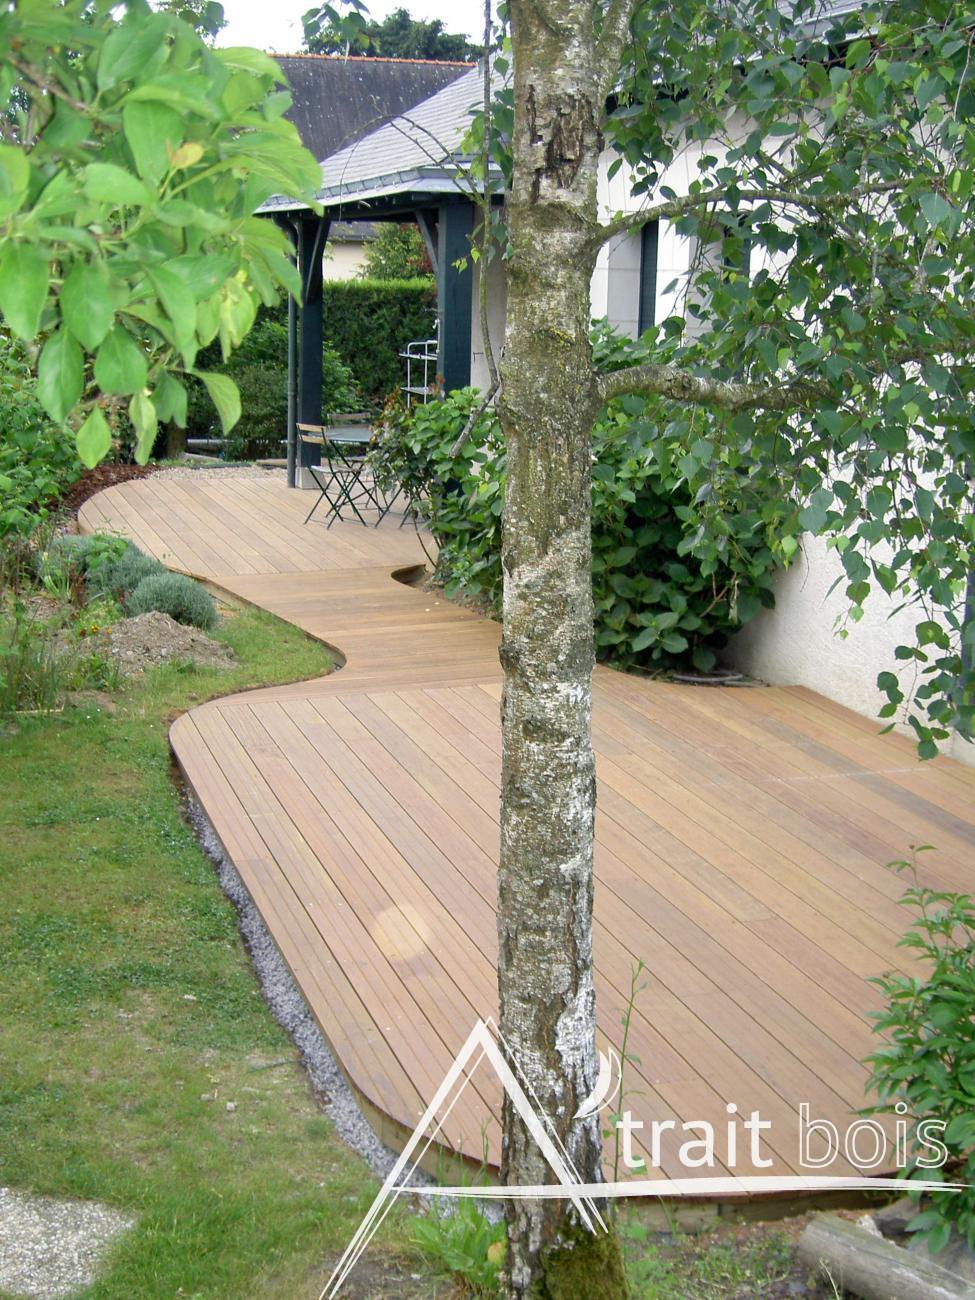 terrasse courbe1